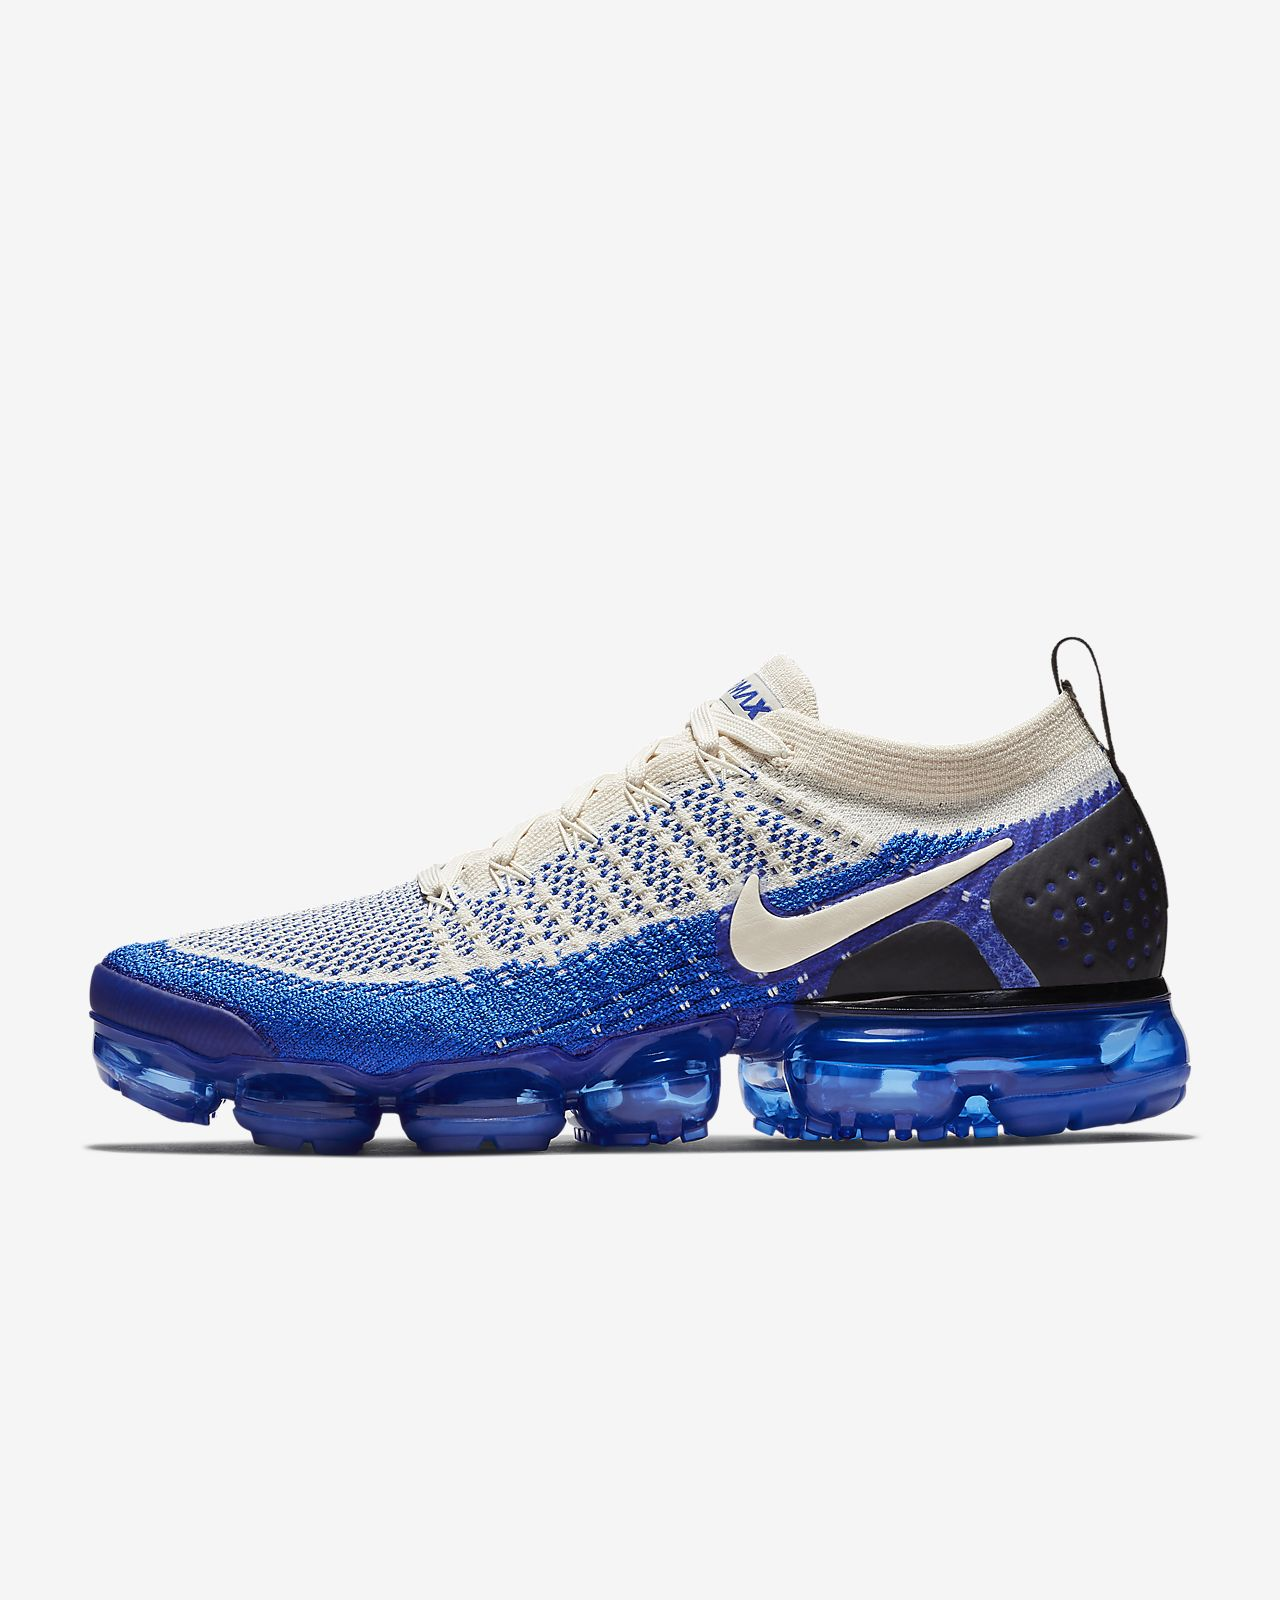 online store 5658e 14075 ... Chaussure Nike Air VaporMax Flyknit 2